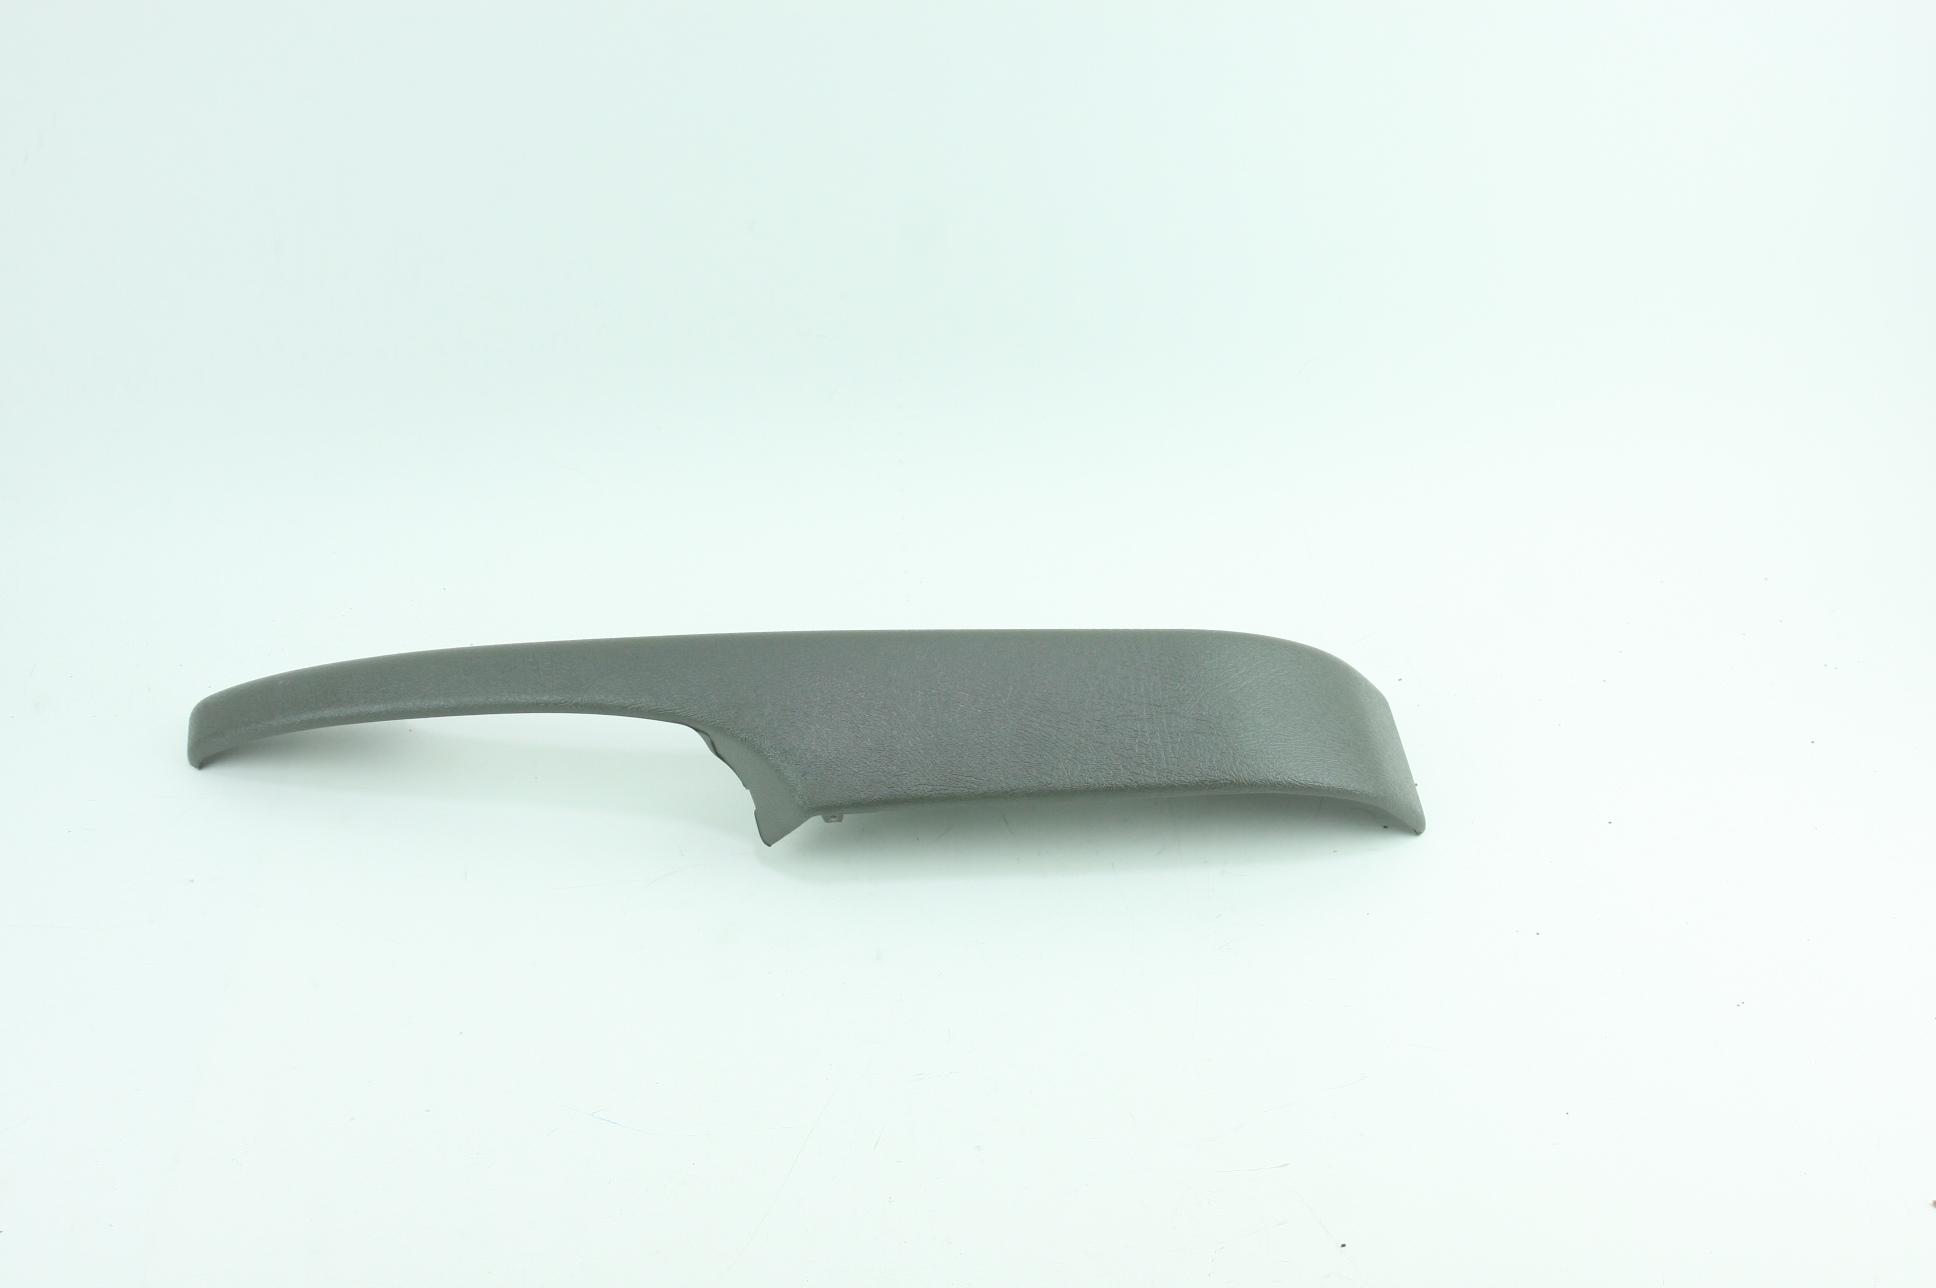 * New OEM 10388387 GM Express Savana Passenger Door Armrest Handle Pewter Gray - image 1